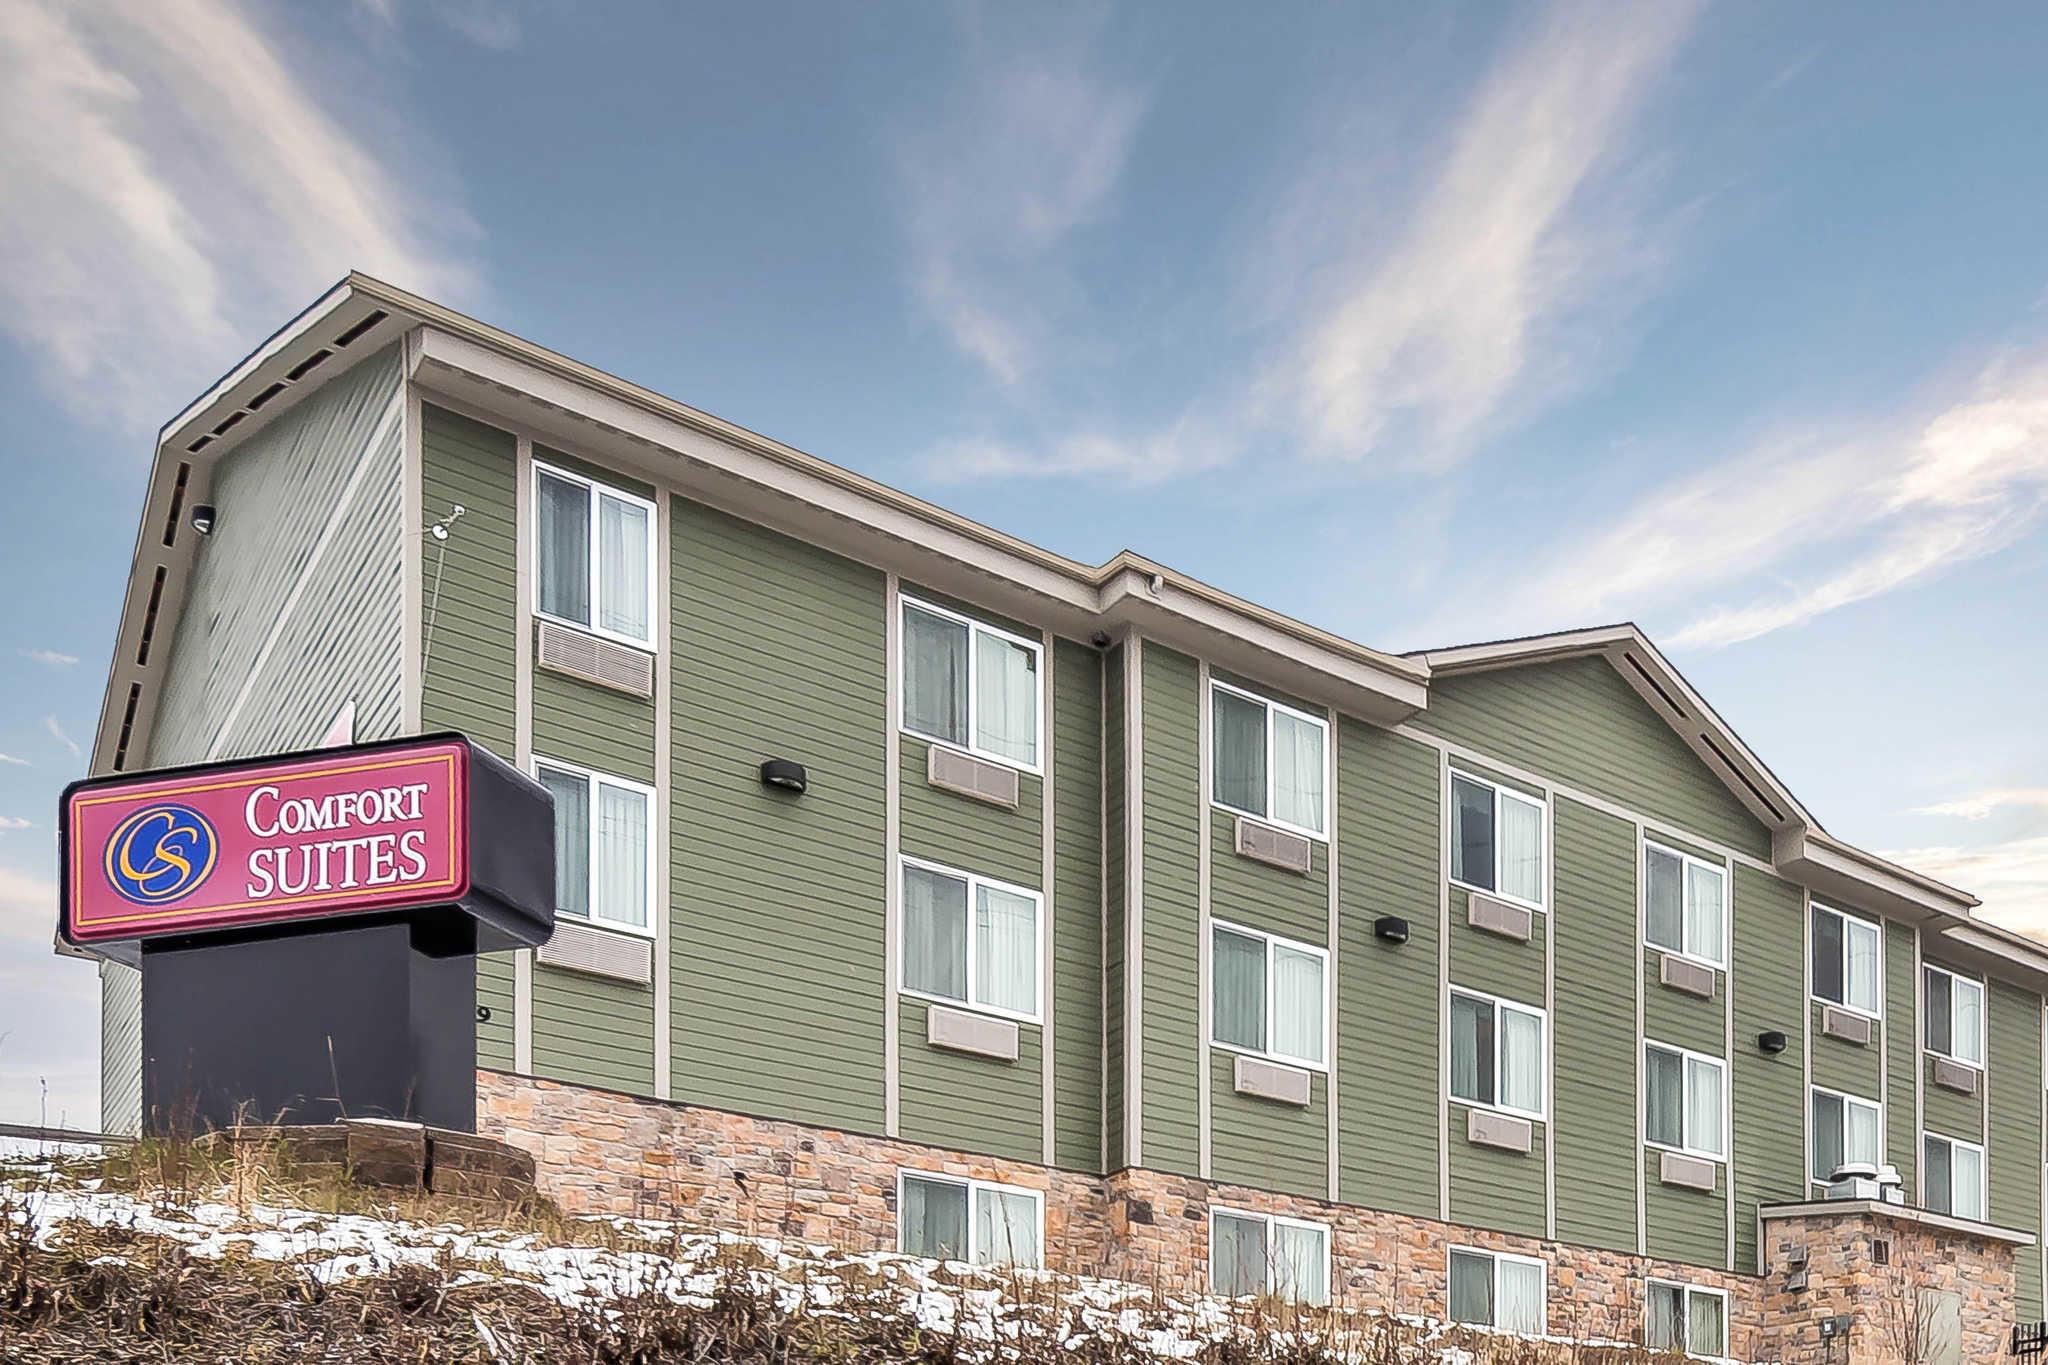 Comfort Suites Anchorage International Airport image 10